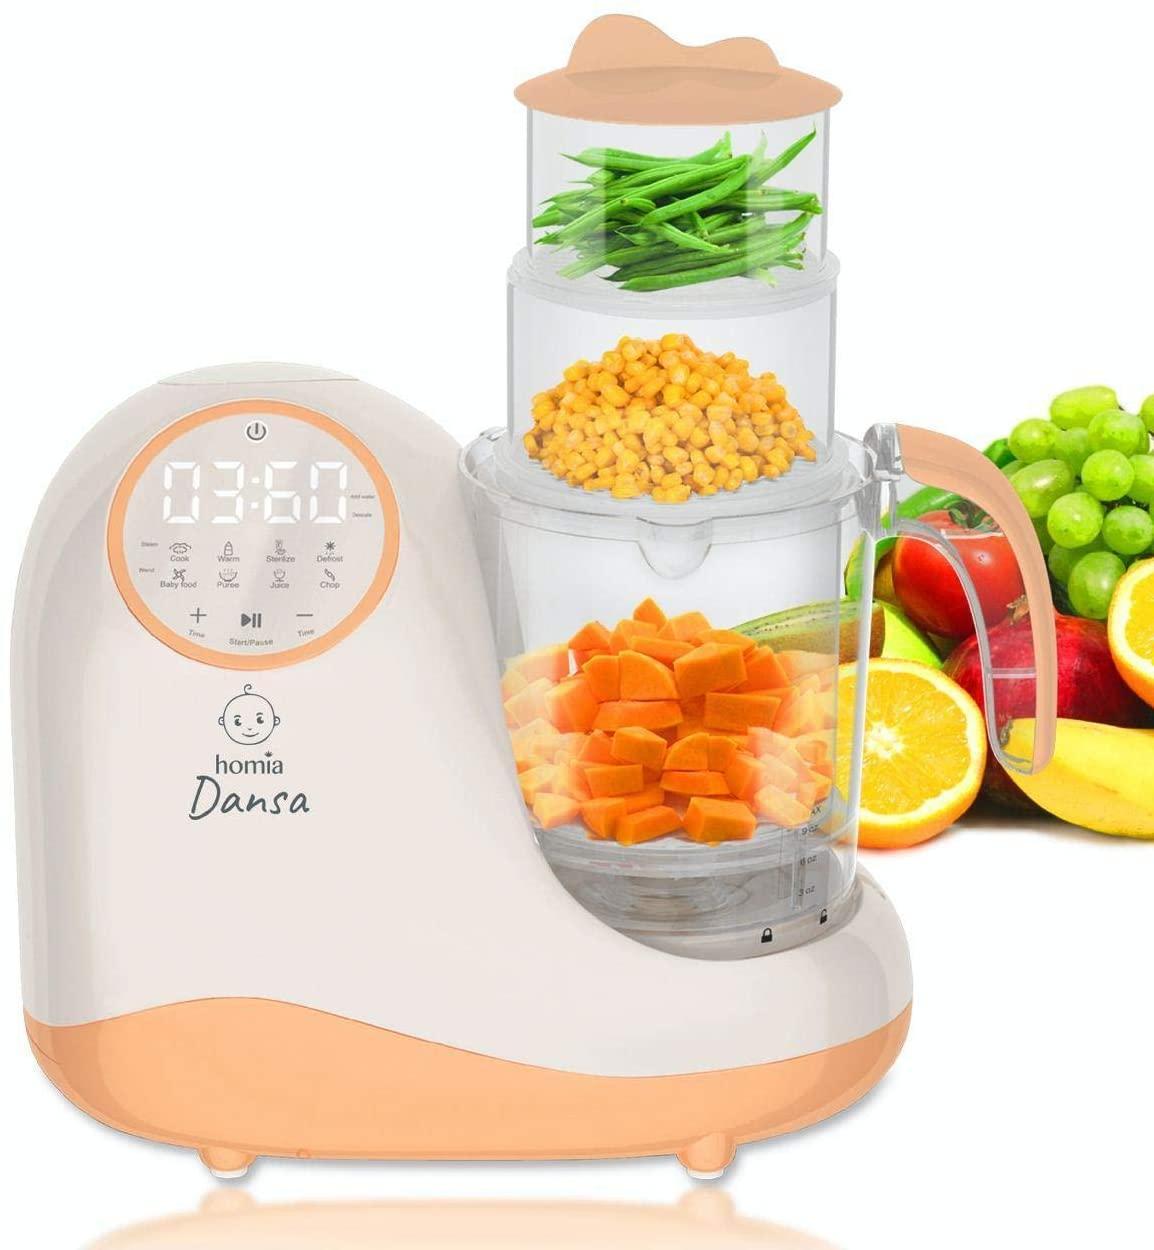 Homia Dansa 8-in-1 Baby Food Maker